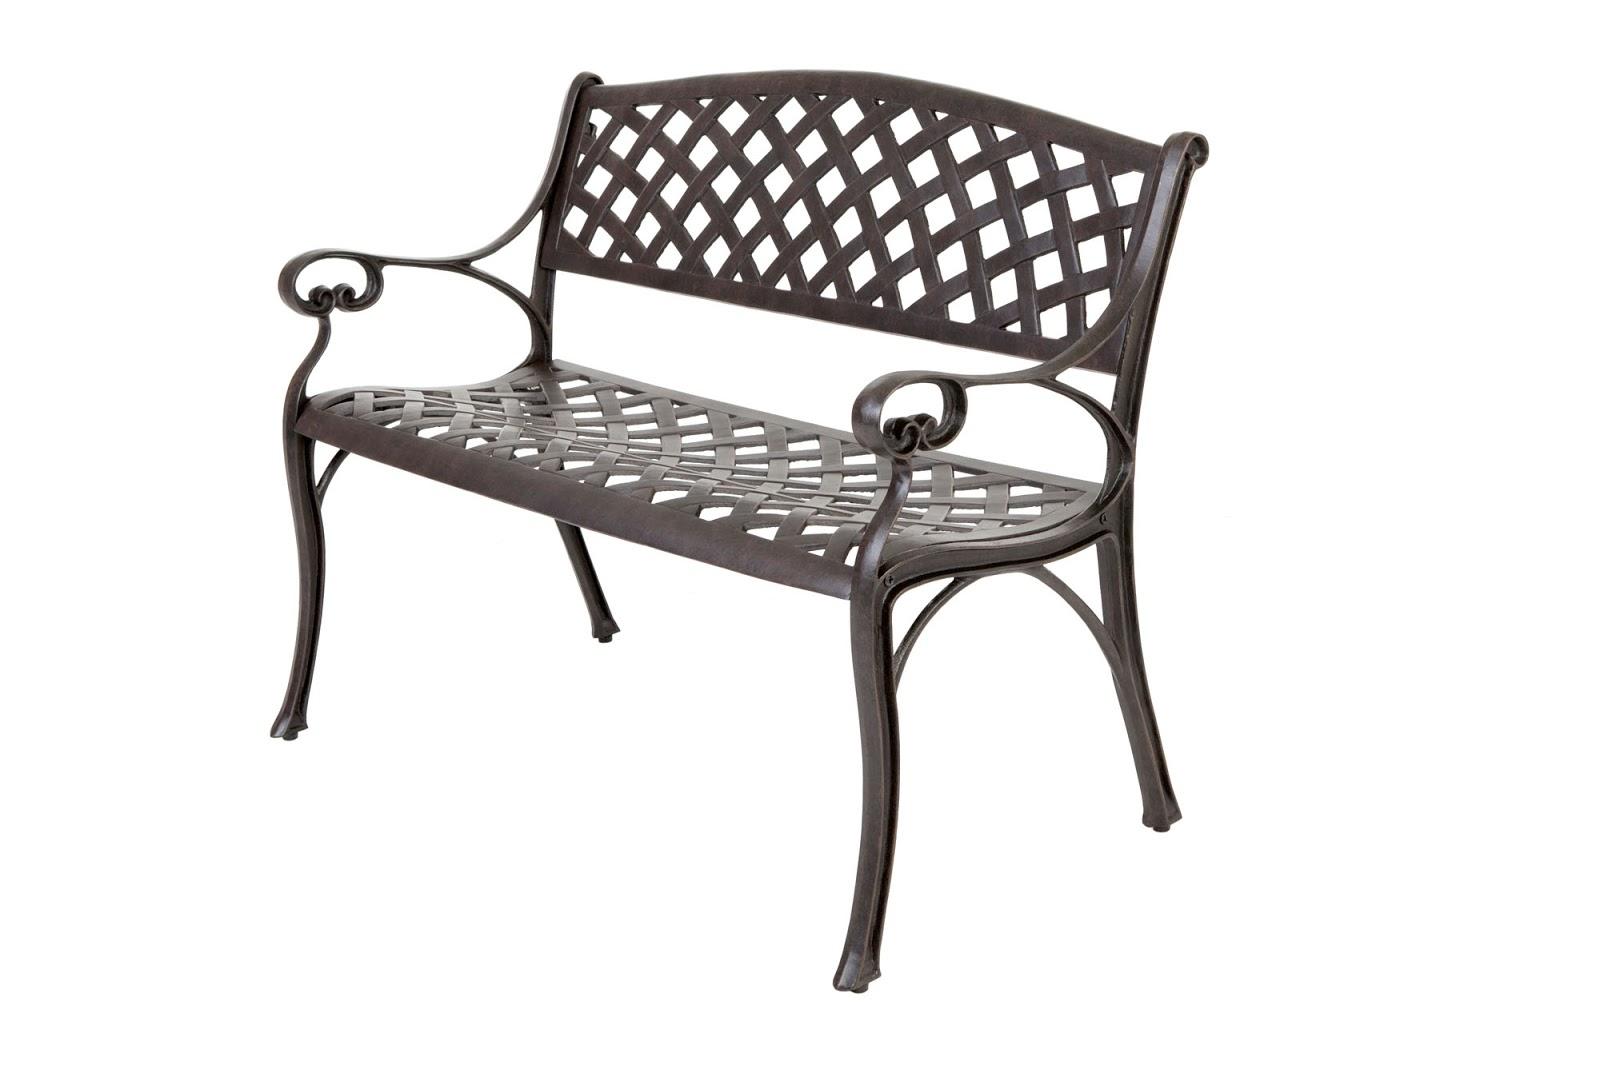 Outside Edge Garden Furniture Blog: Free Cast Aluminium